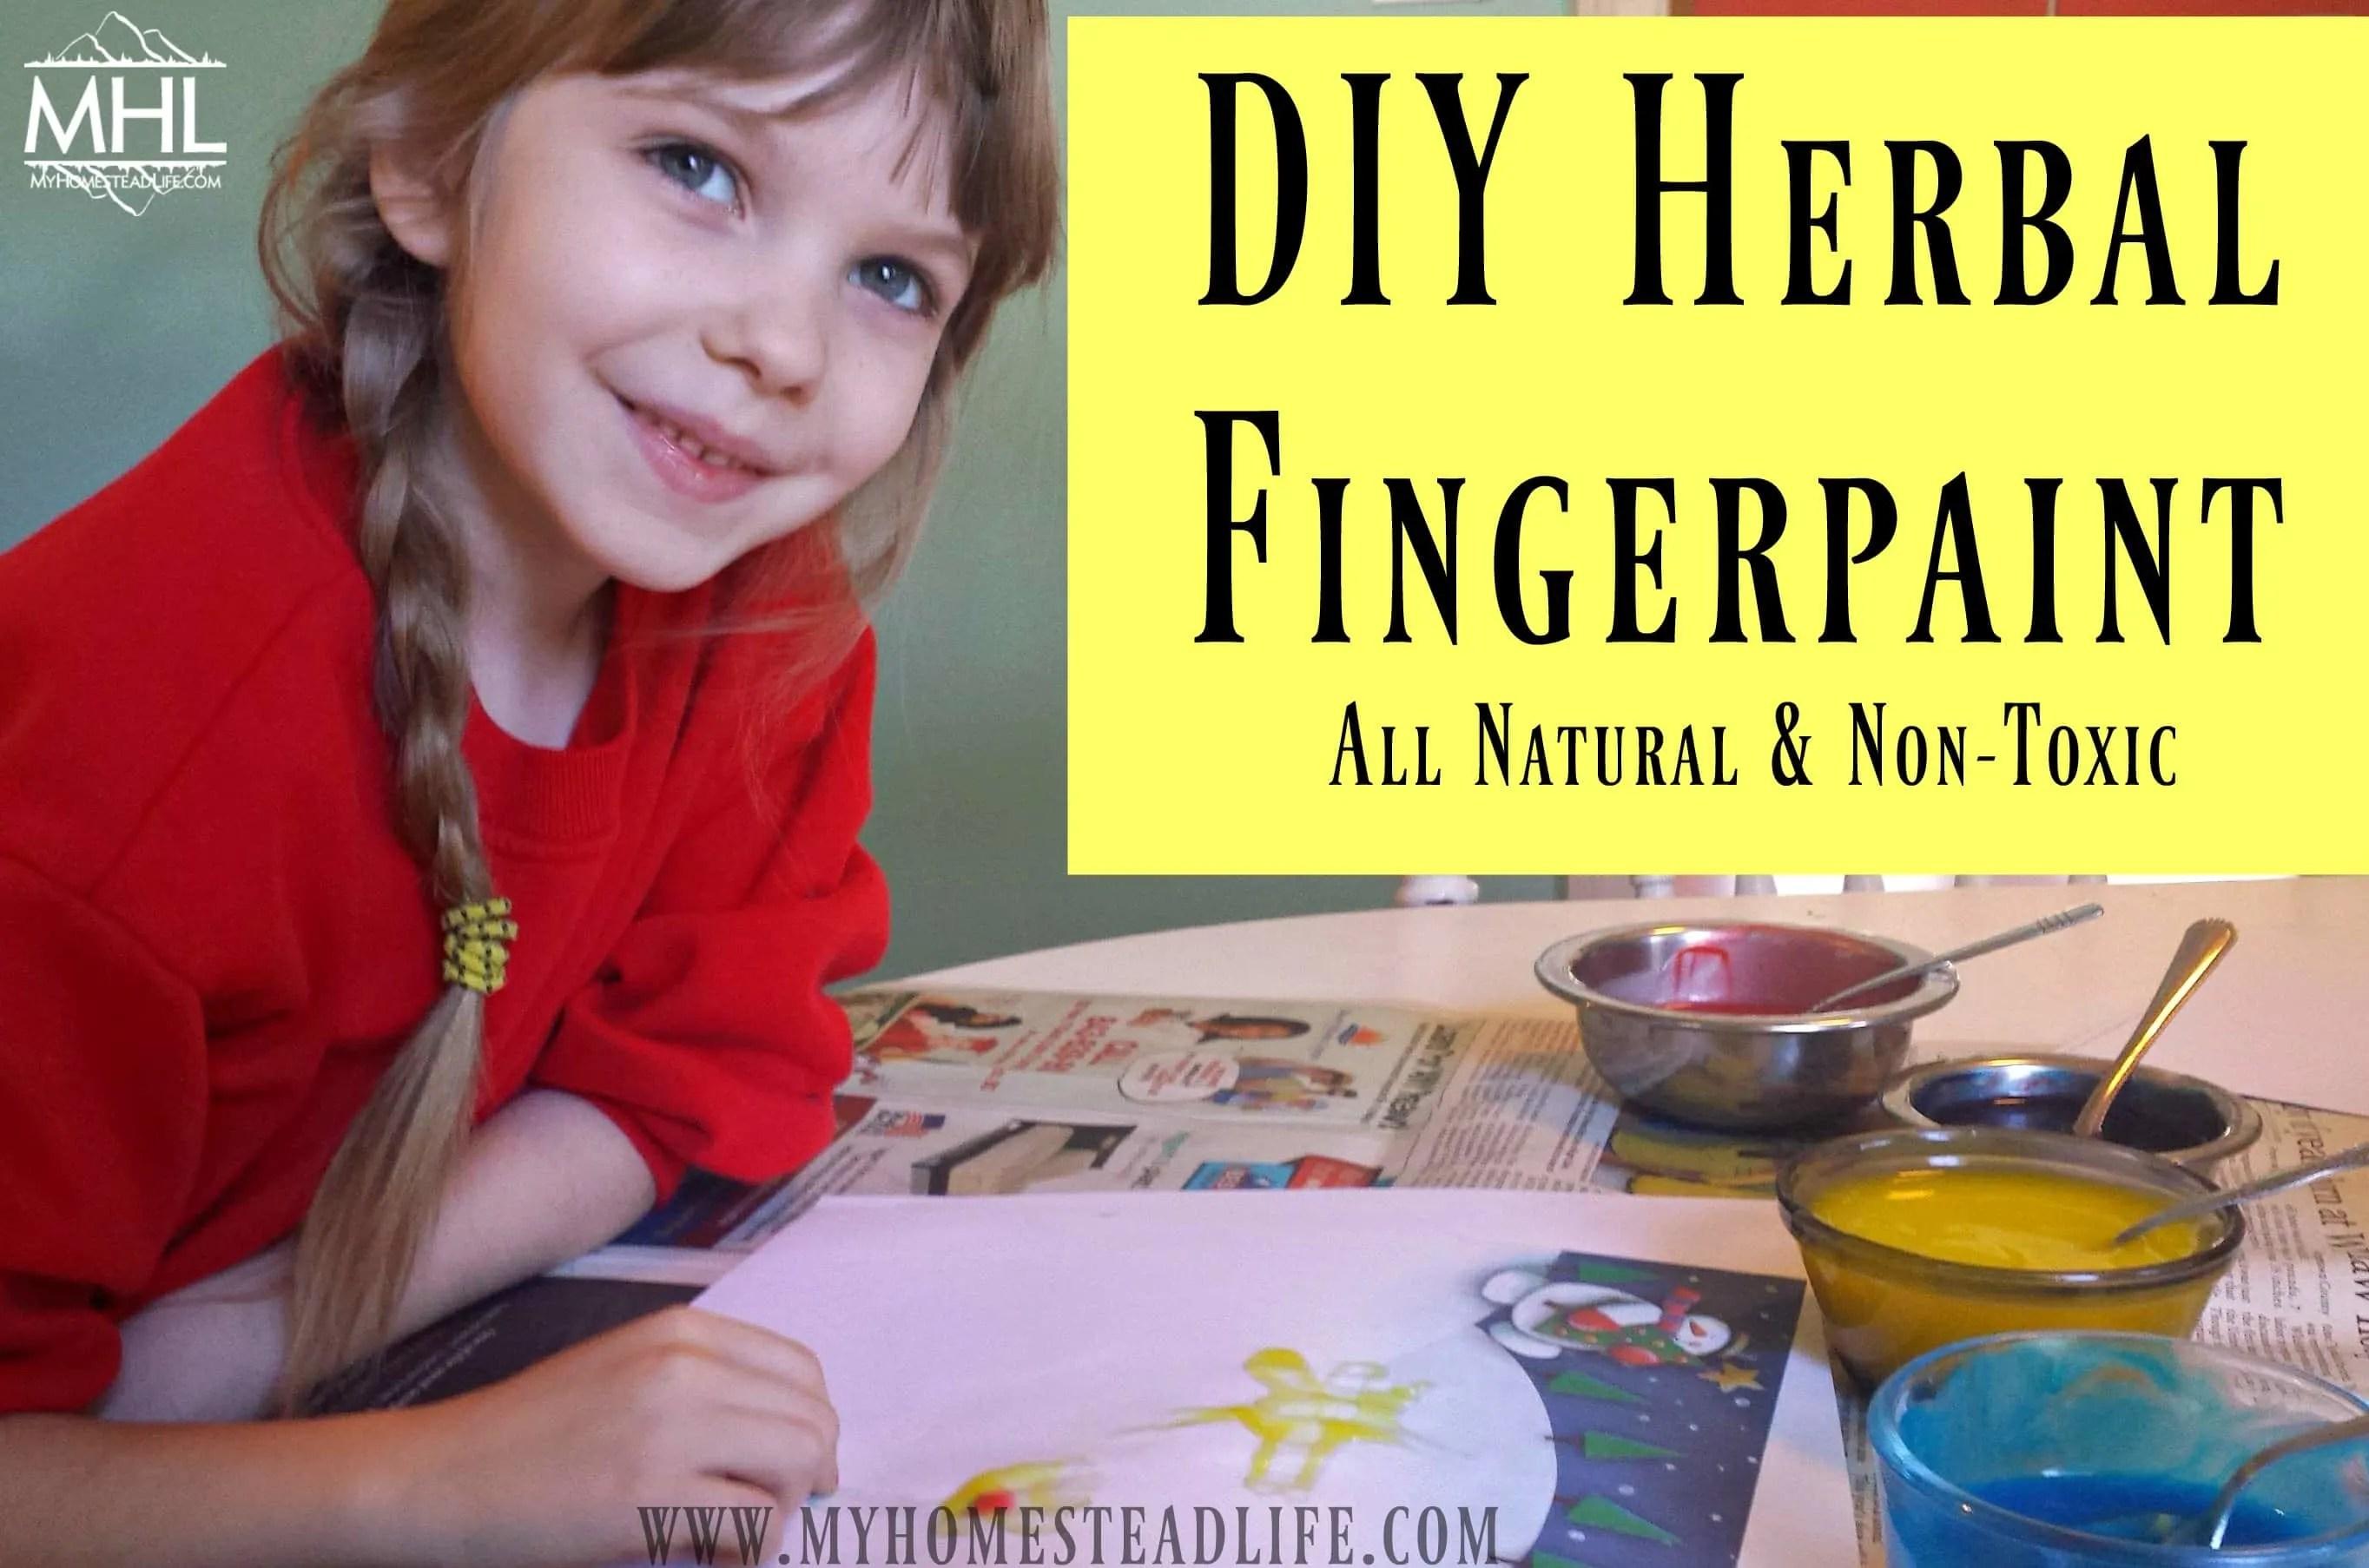 DIY Herbal Fingerpaint Recipe